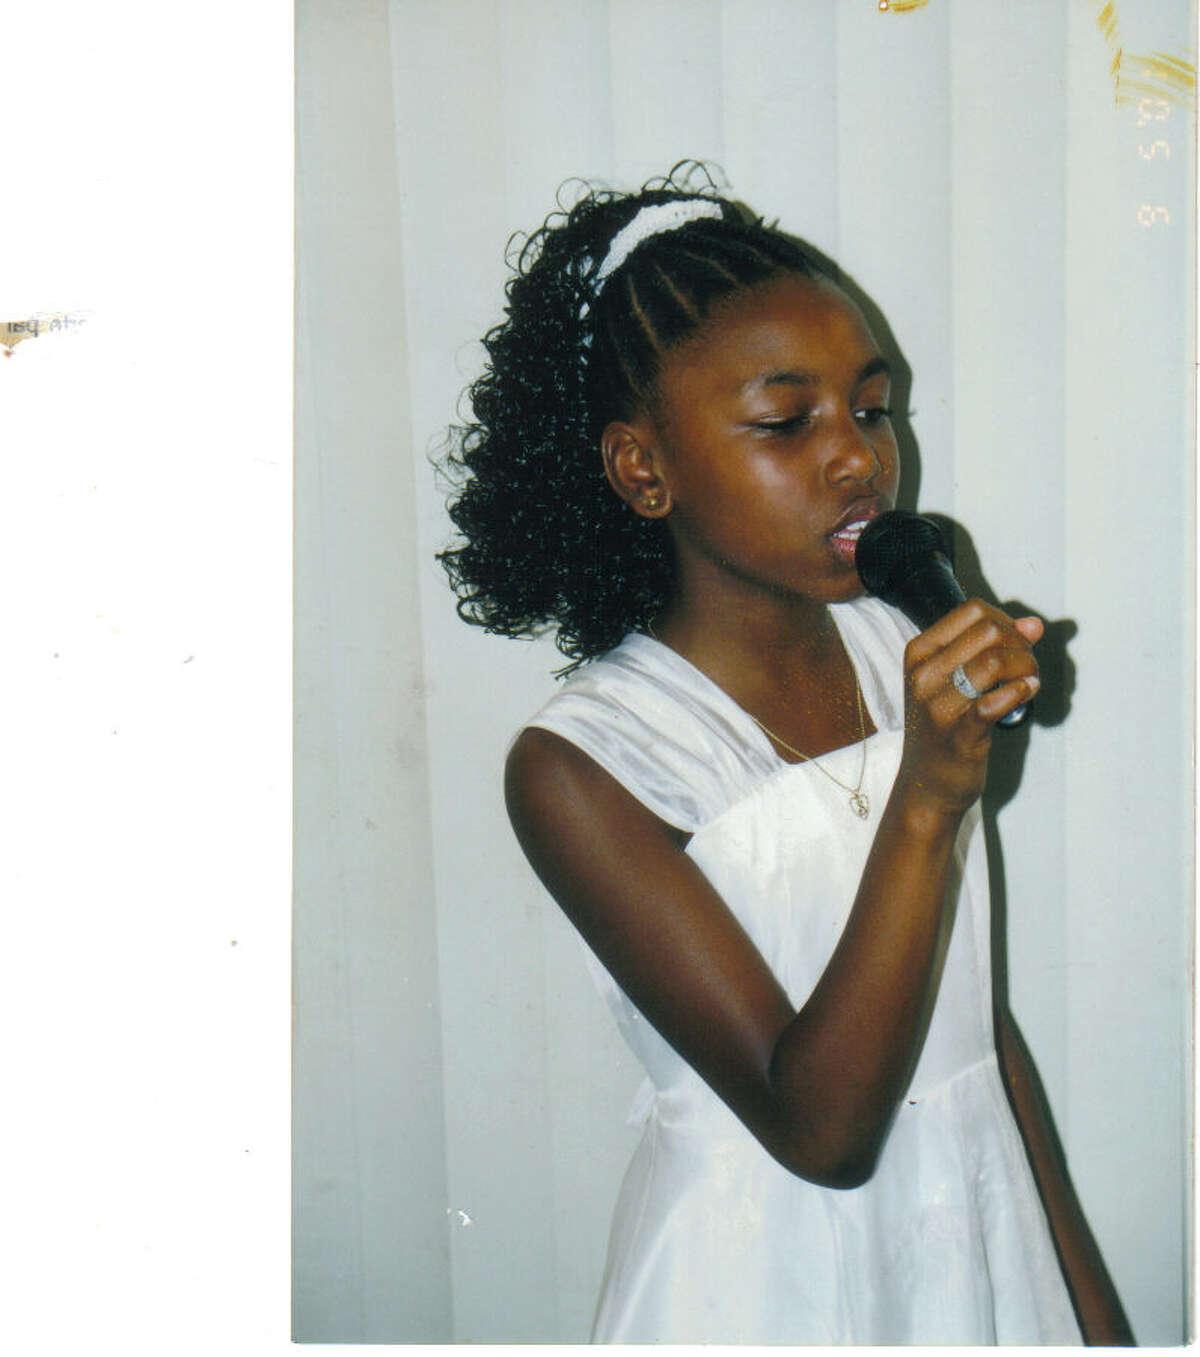 Tamara Chauniece was 10 when she sang at this wedding.